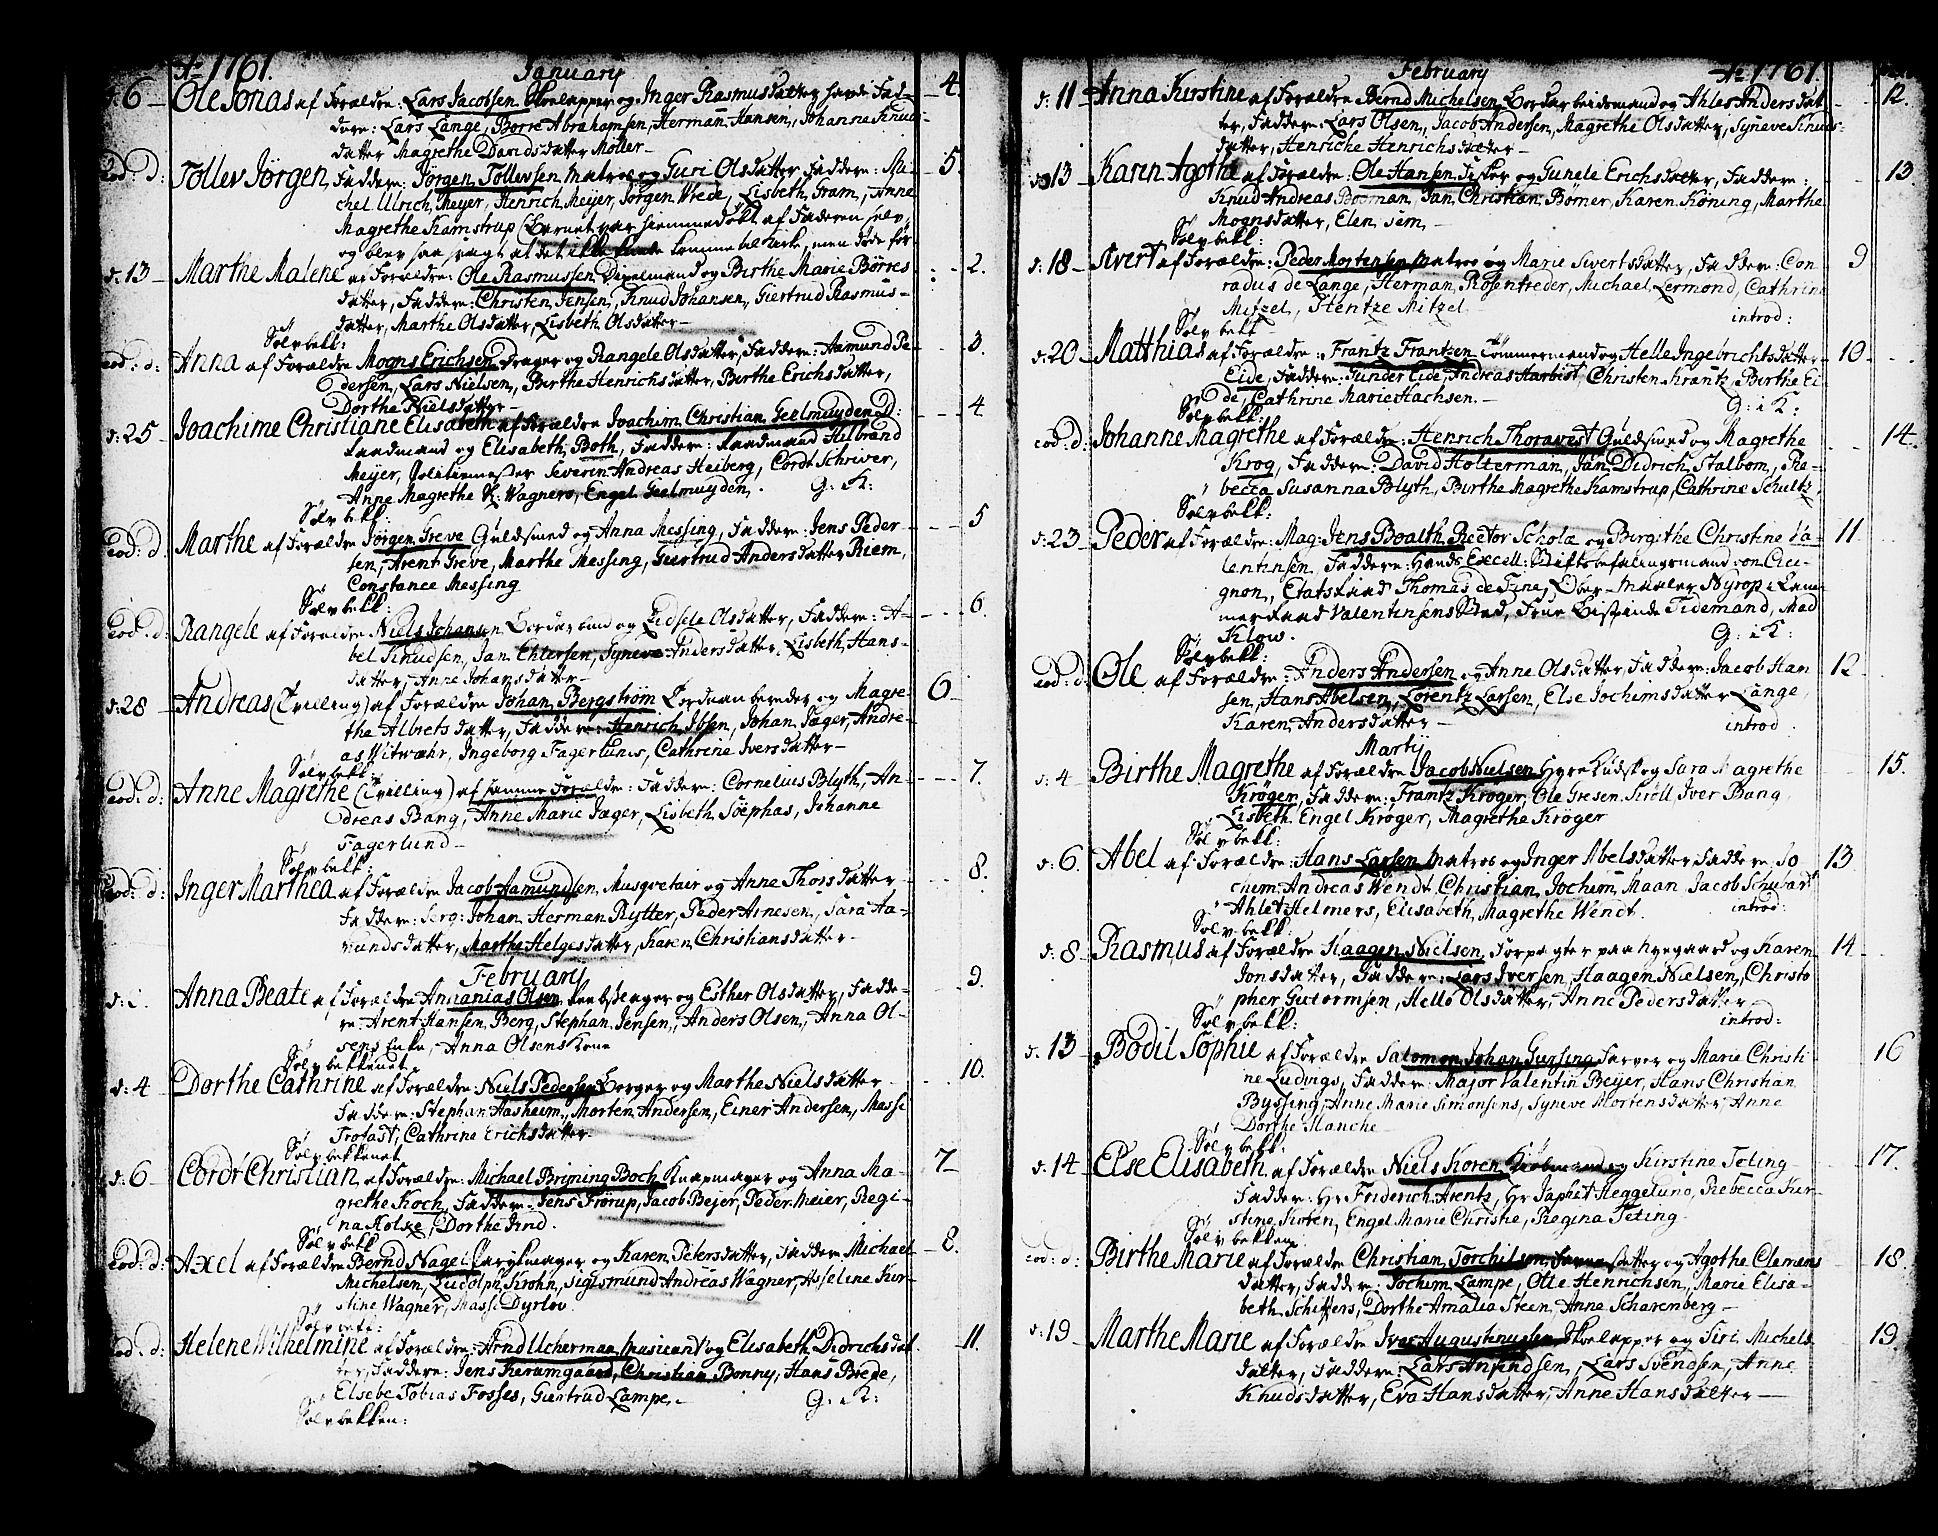 SAB, Domkirken sokneprestembete, H/Haa/L0003: Ministerialbok nr. A 3, 1758-1789, s. 36-37